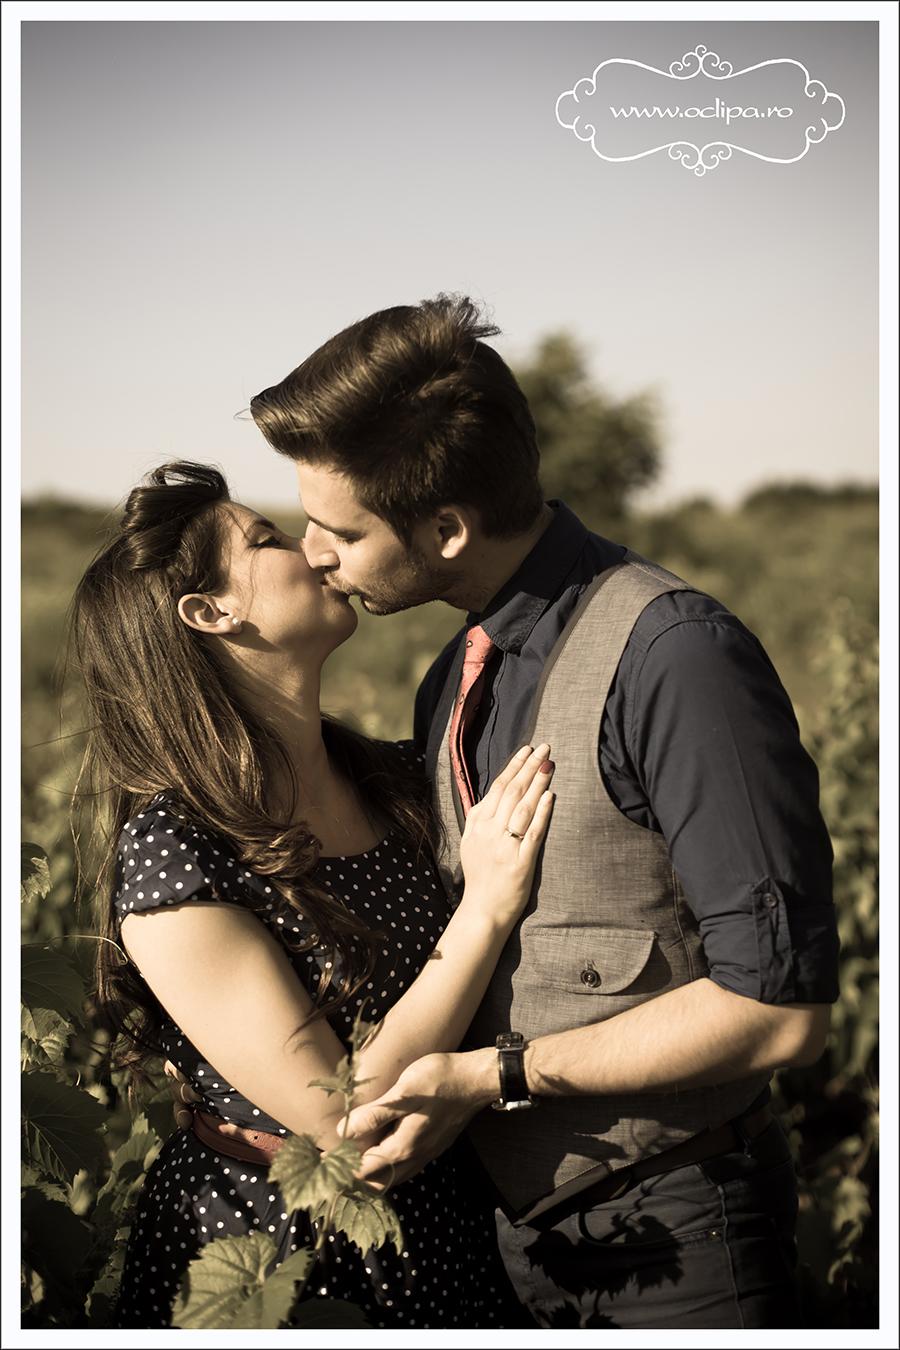 Dating fotograf